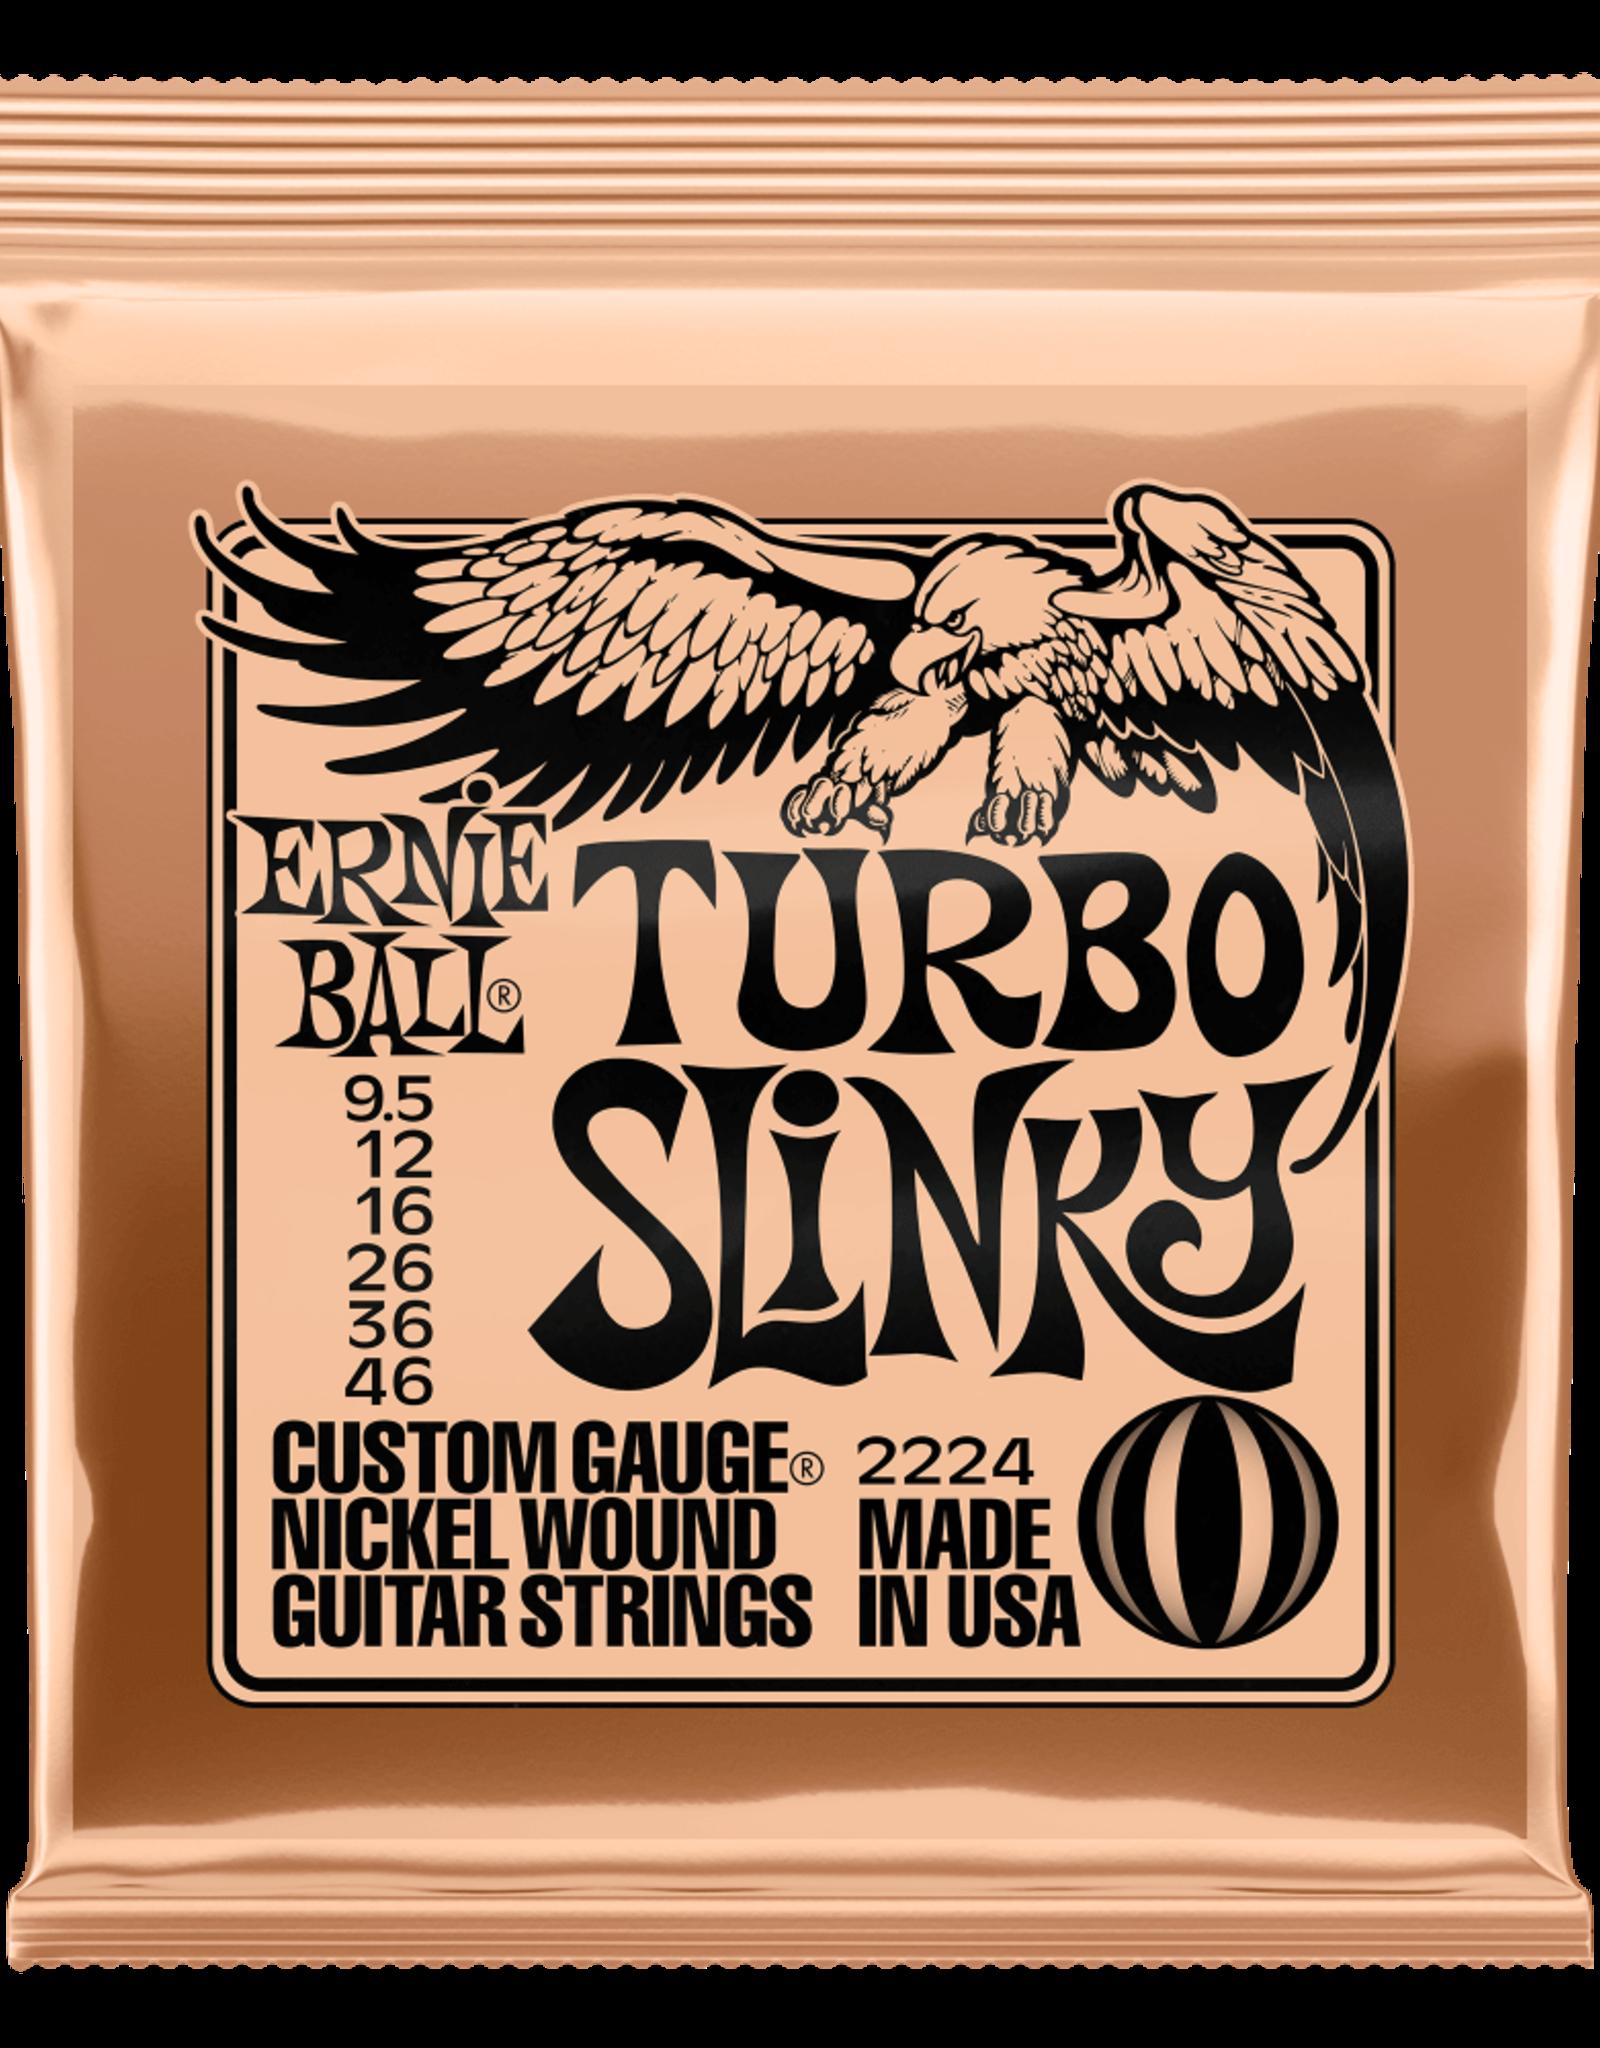 Ernie Ball Ernie Ball Turbo Slinky Nickel Wound 9.5-46